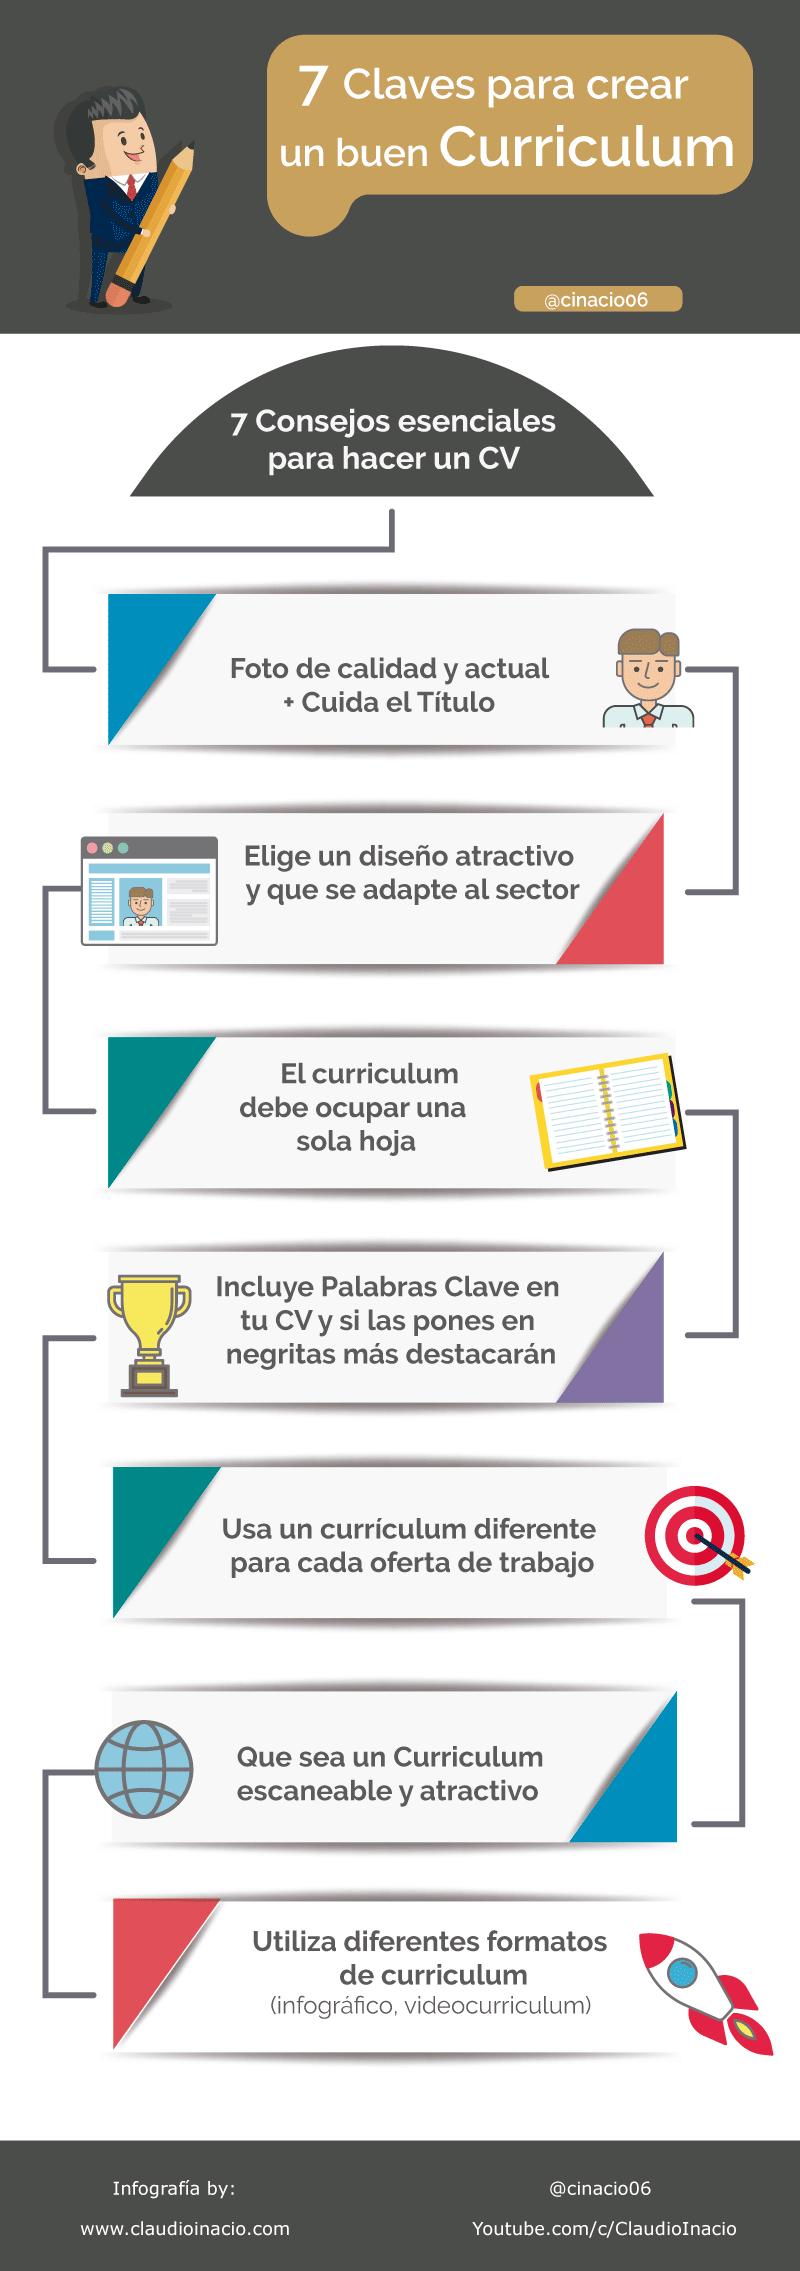 Infografia claves para crear curriculums plantillas curriculum viate